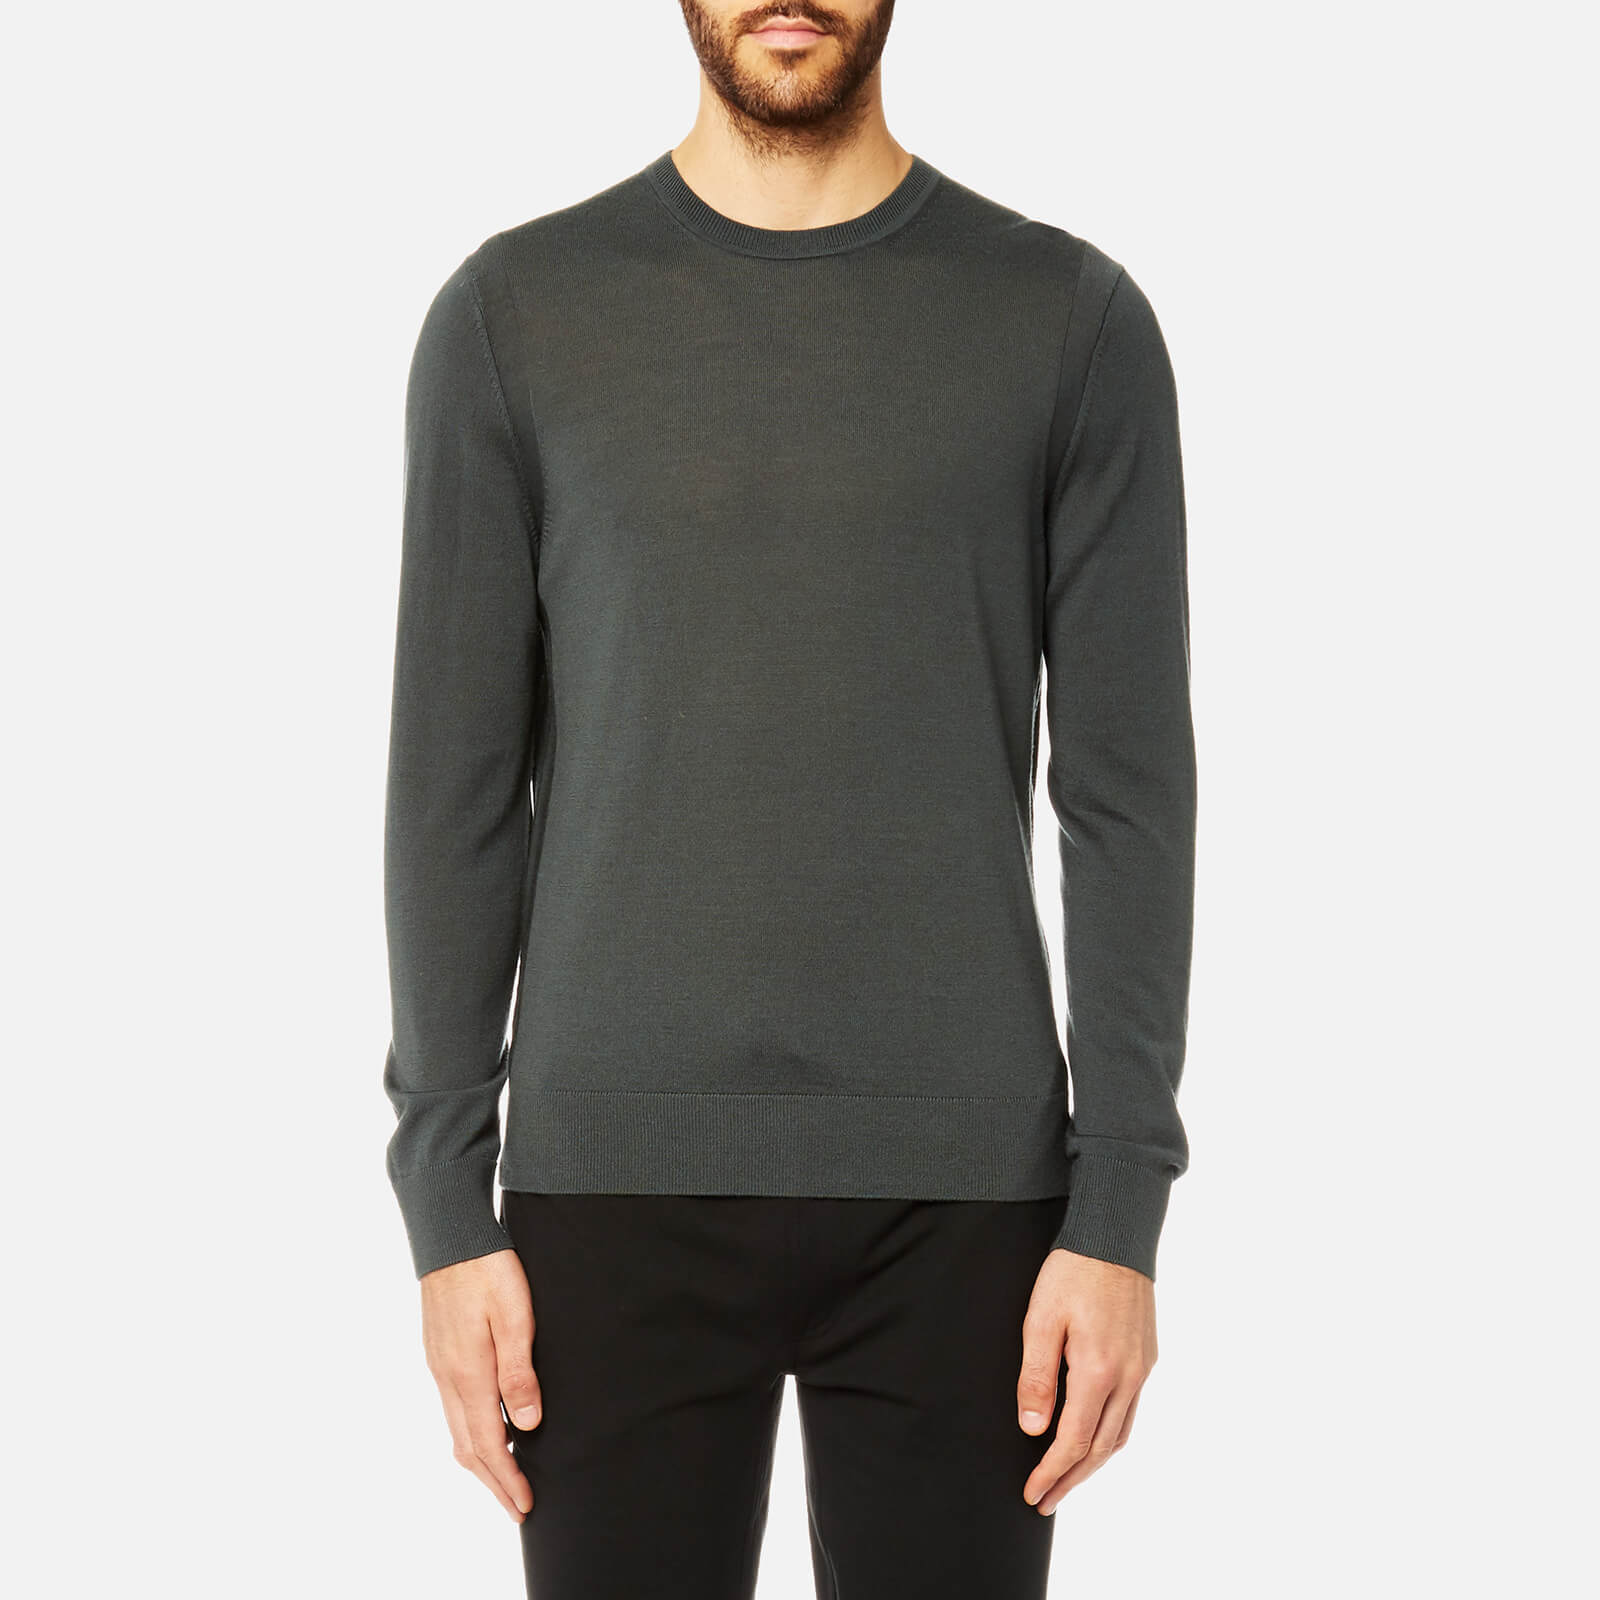 e5788b11537cd7 Michael Kors Men's Merino 14GG Crew Neck Long Sleeve Sweatshirt - Cedar  Green - Free UK Delivery over £50